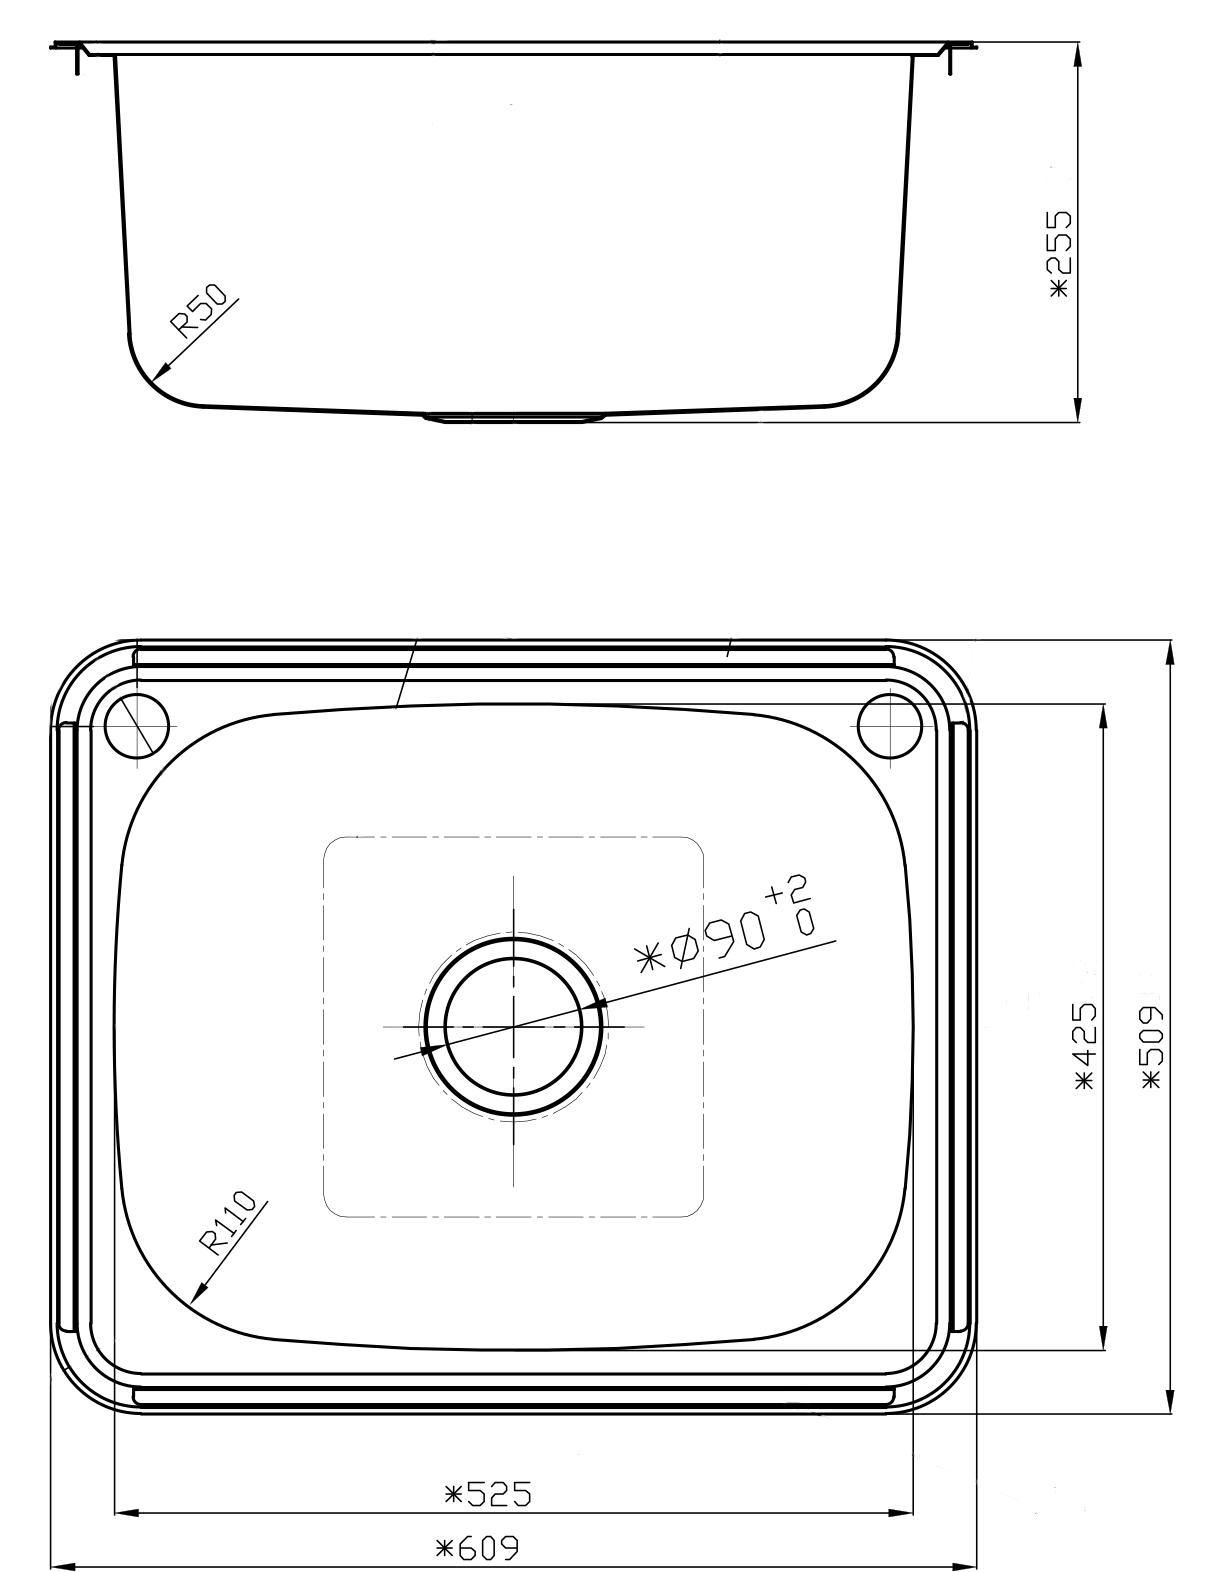 Format 45 Litre Laundry Tub